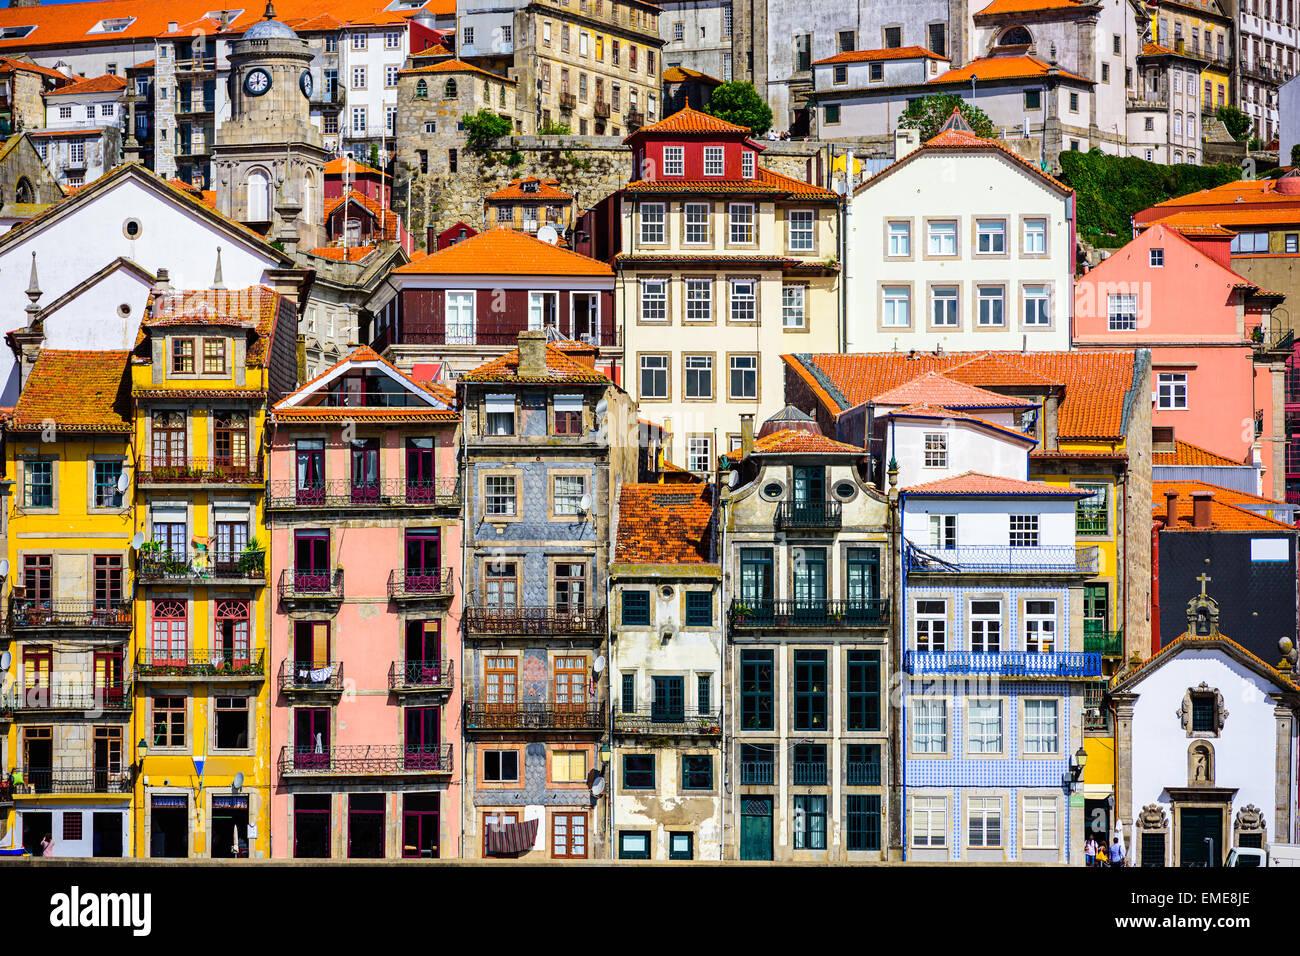 Porto, Portugal old buildings. - Stock Image